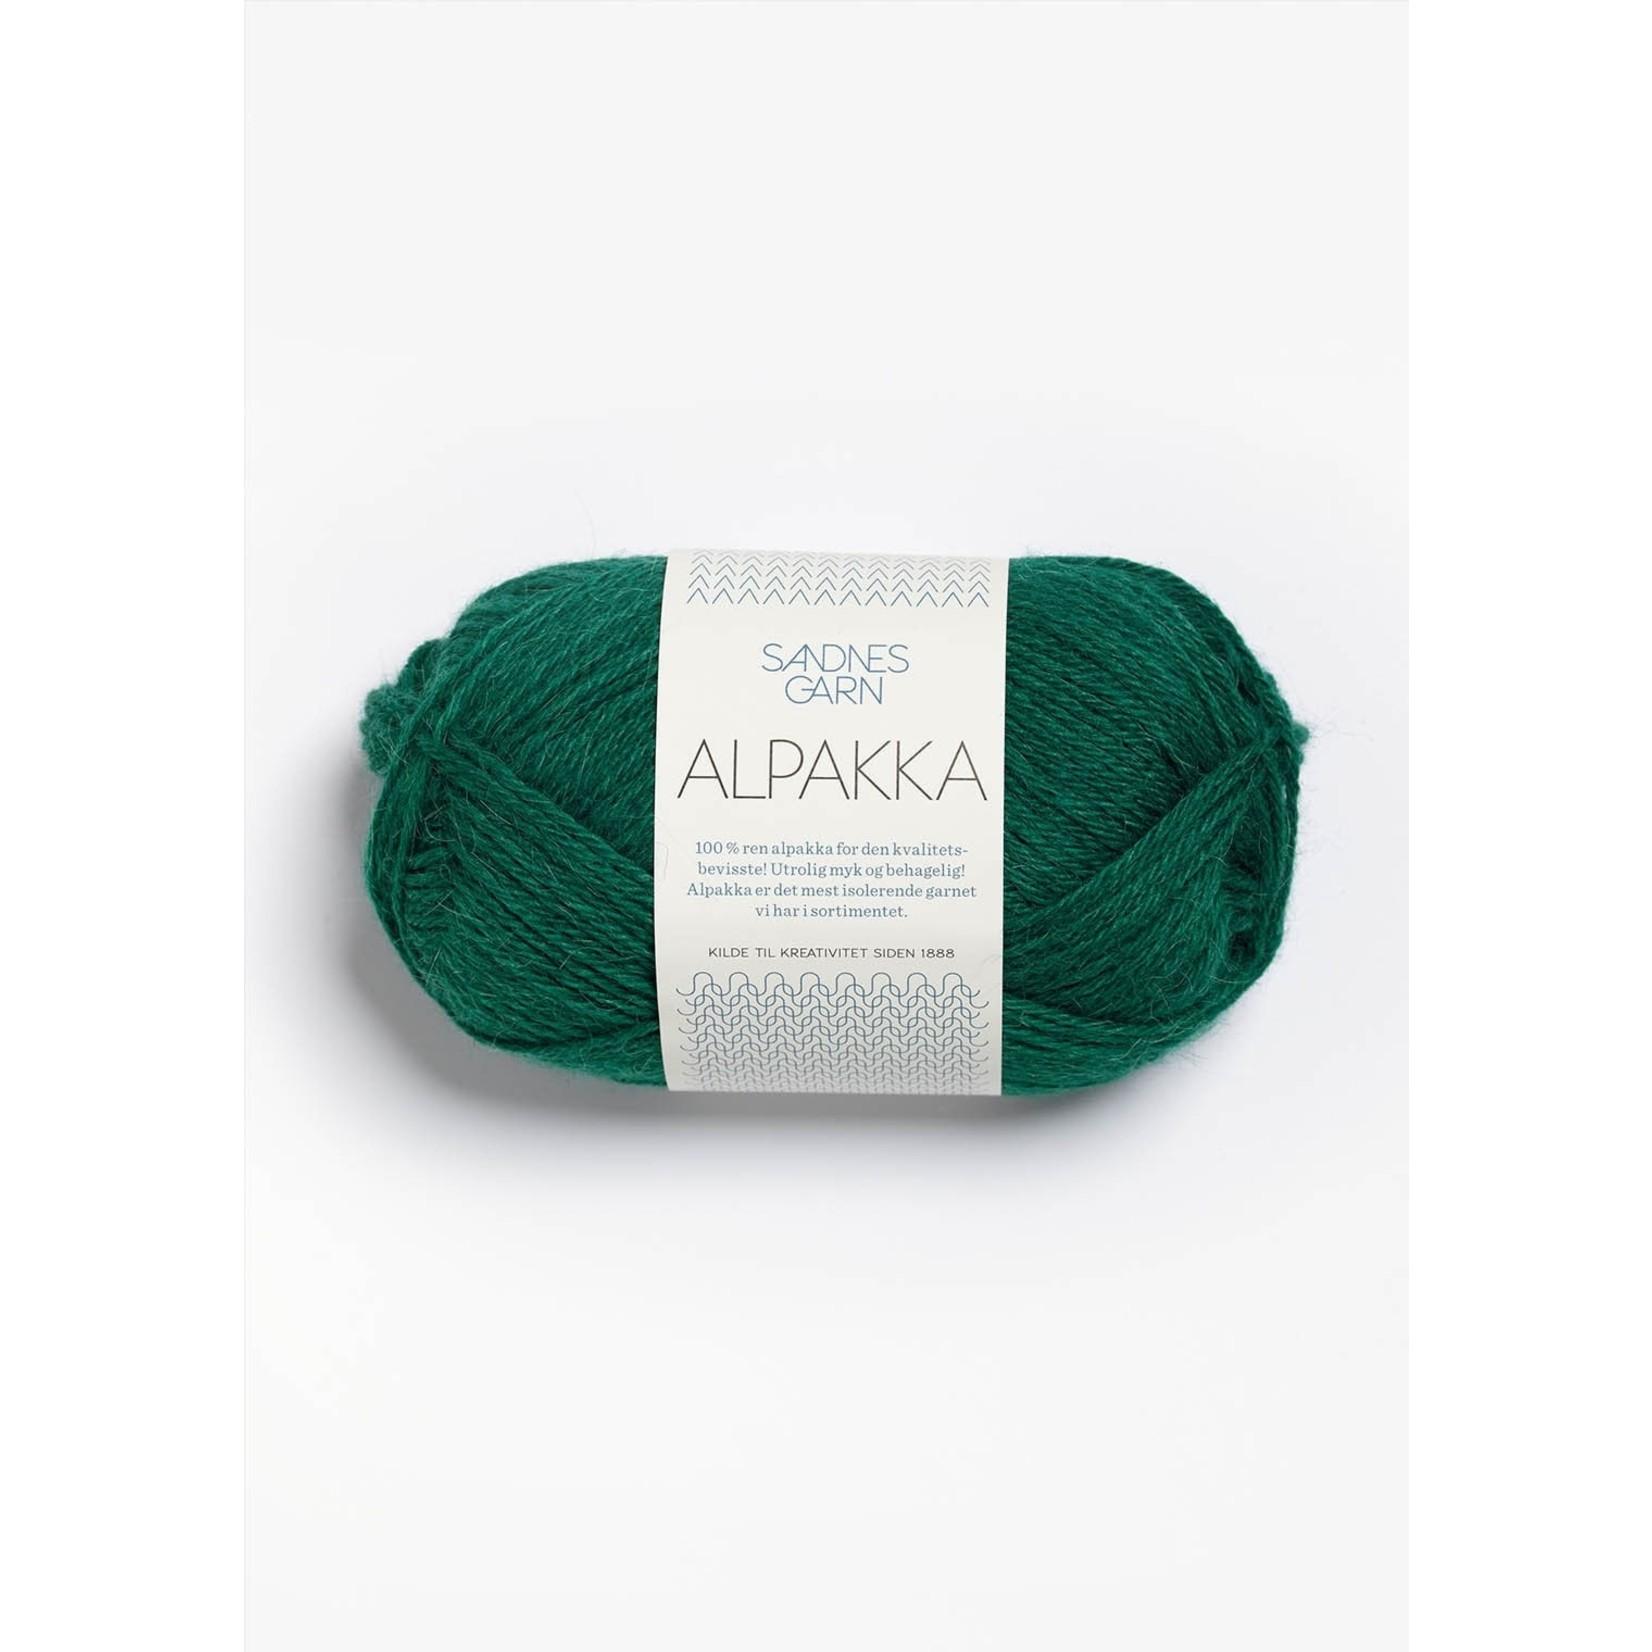 Sandnes Garn Alpakka, 7755, Emerald